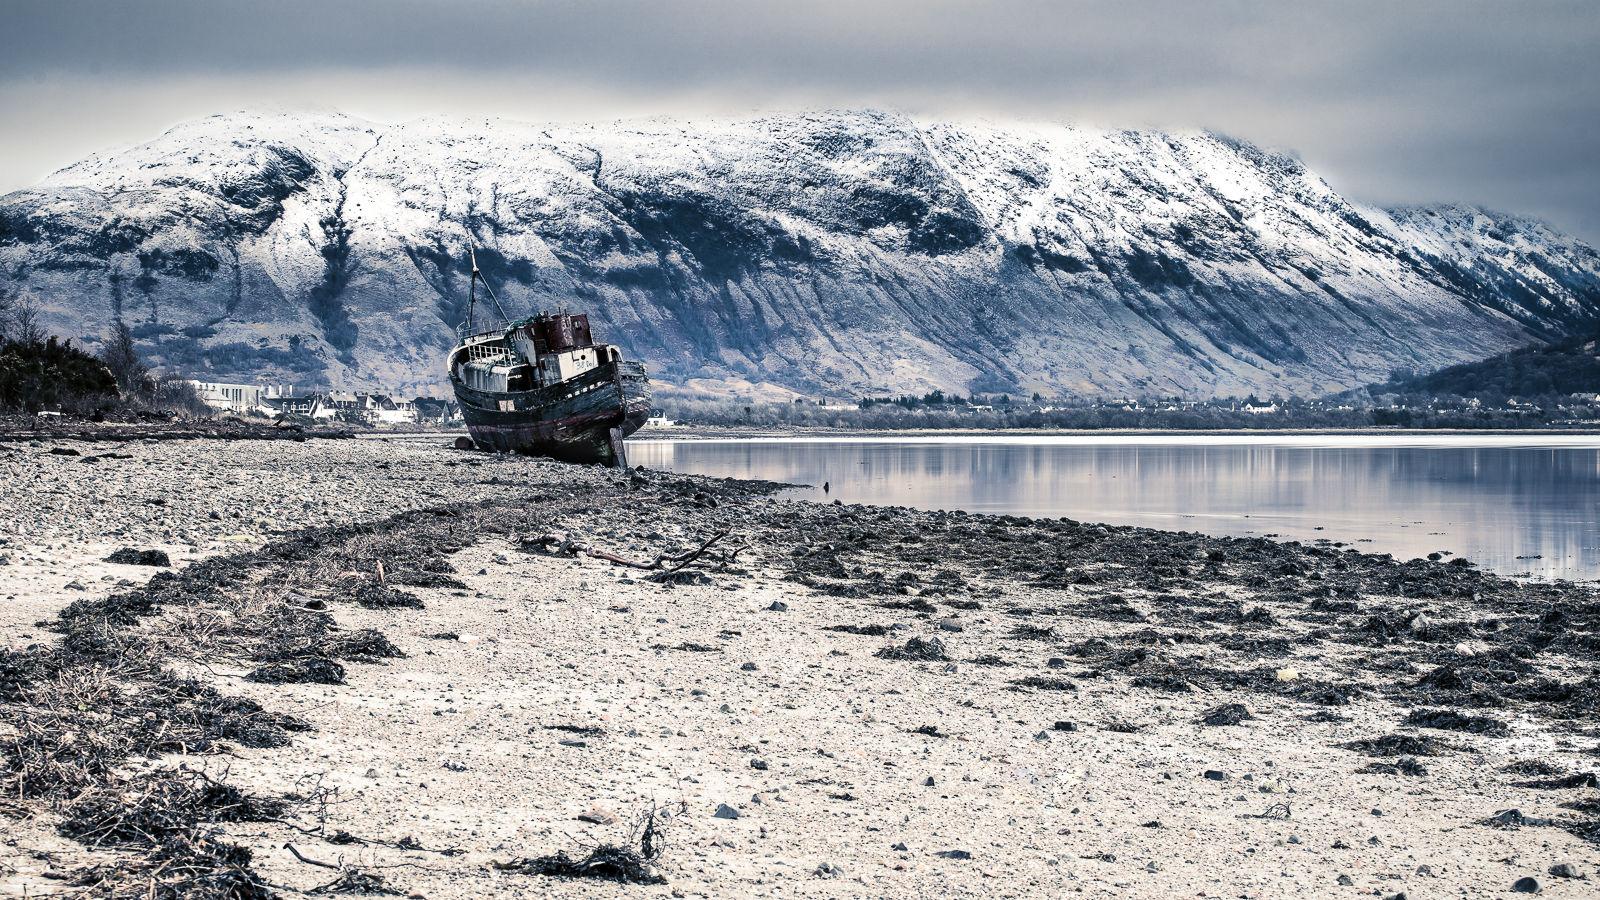 Wreck of the MV Dayspring